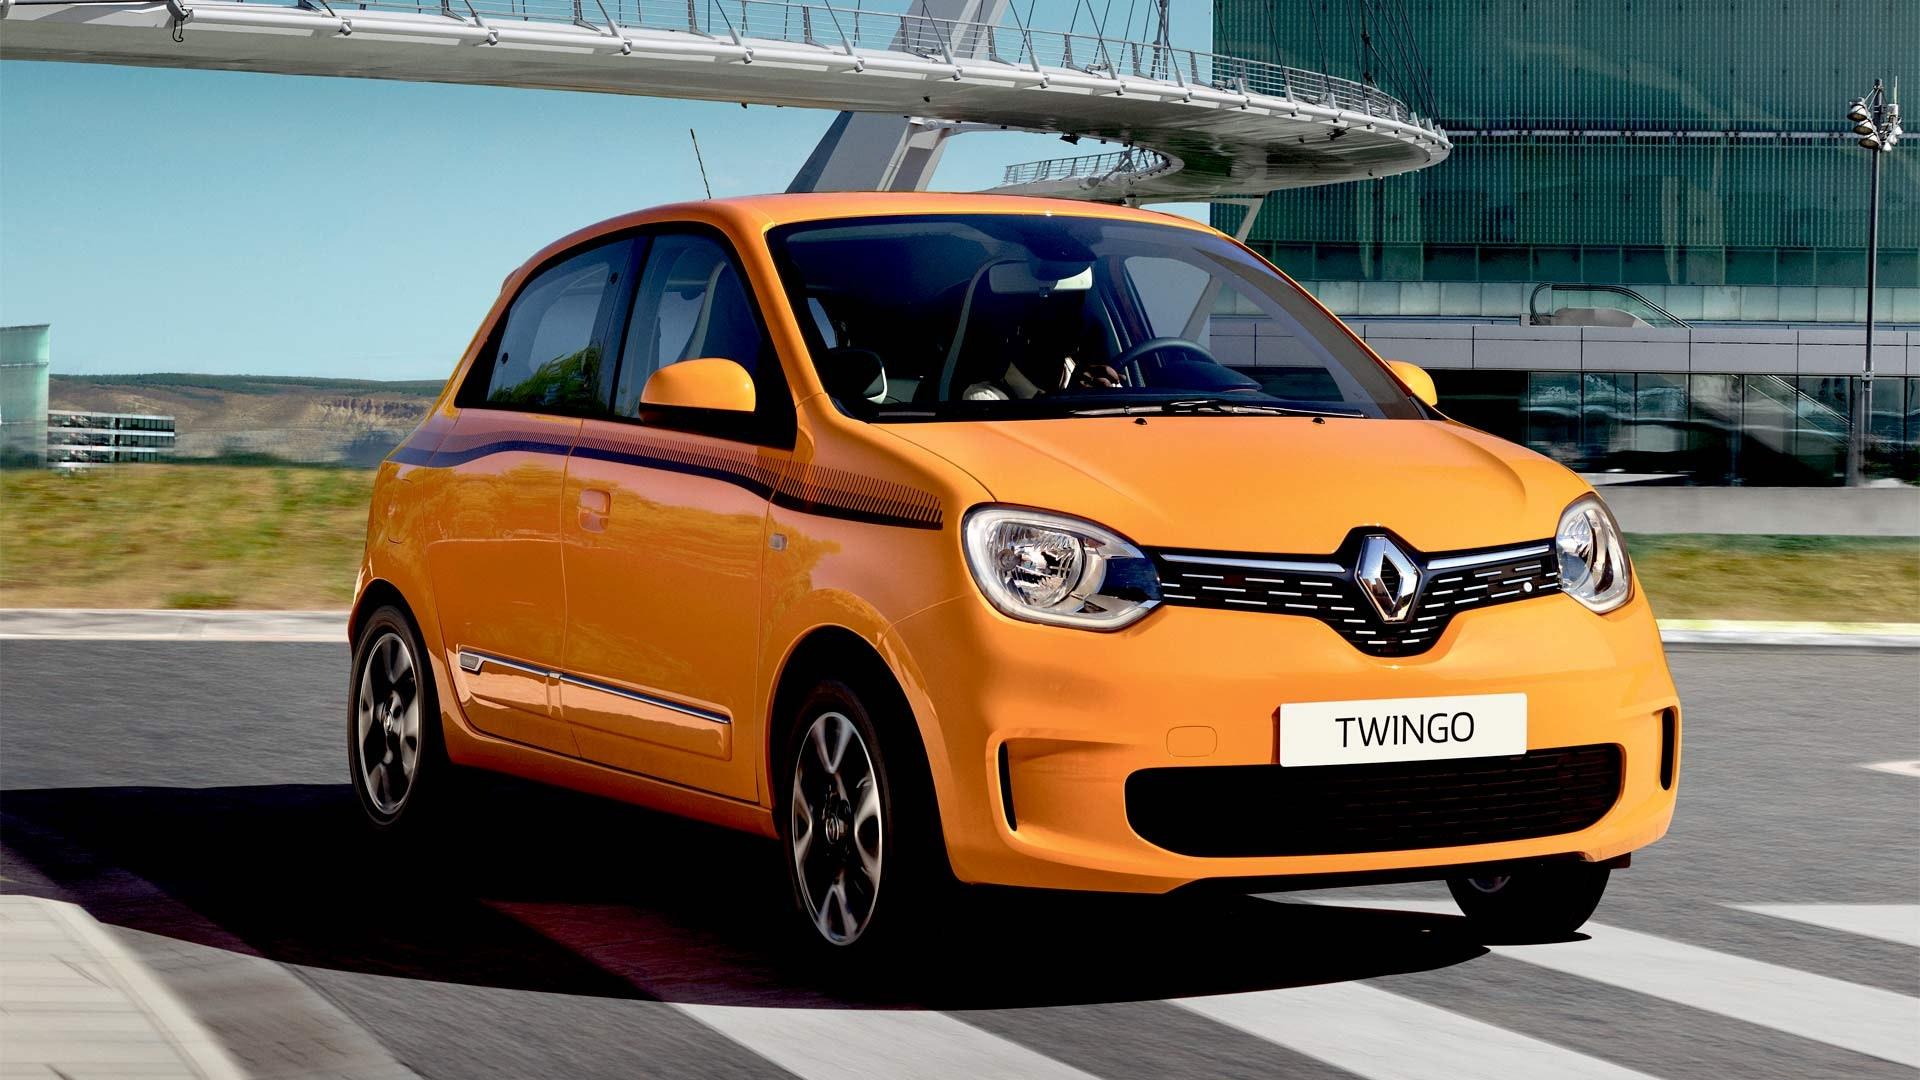 Renault Twingo orange forfra